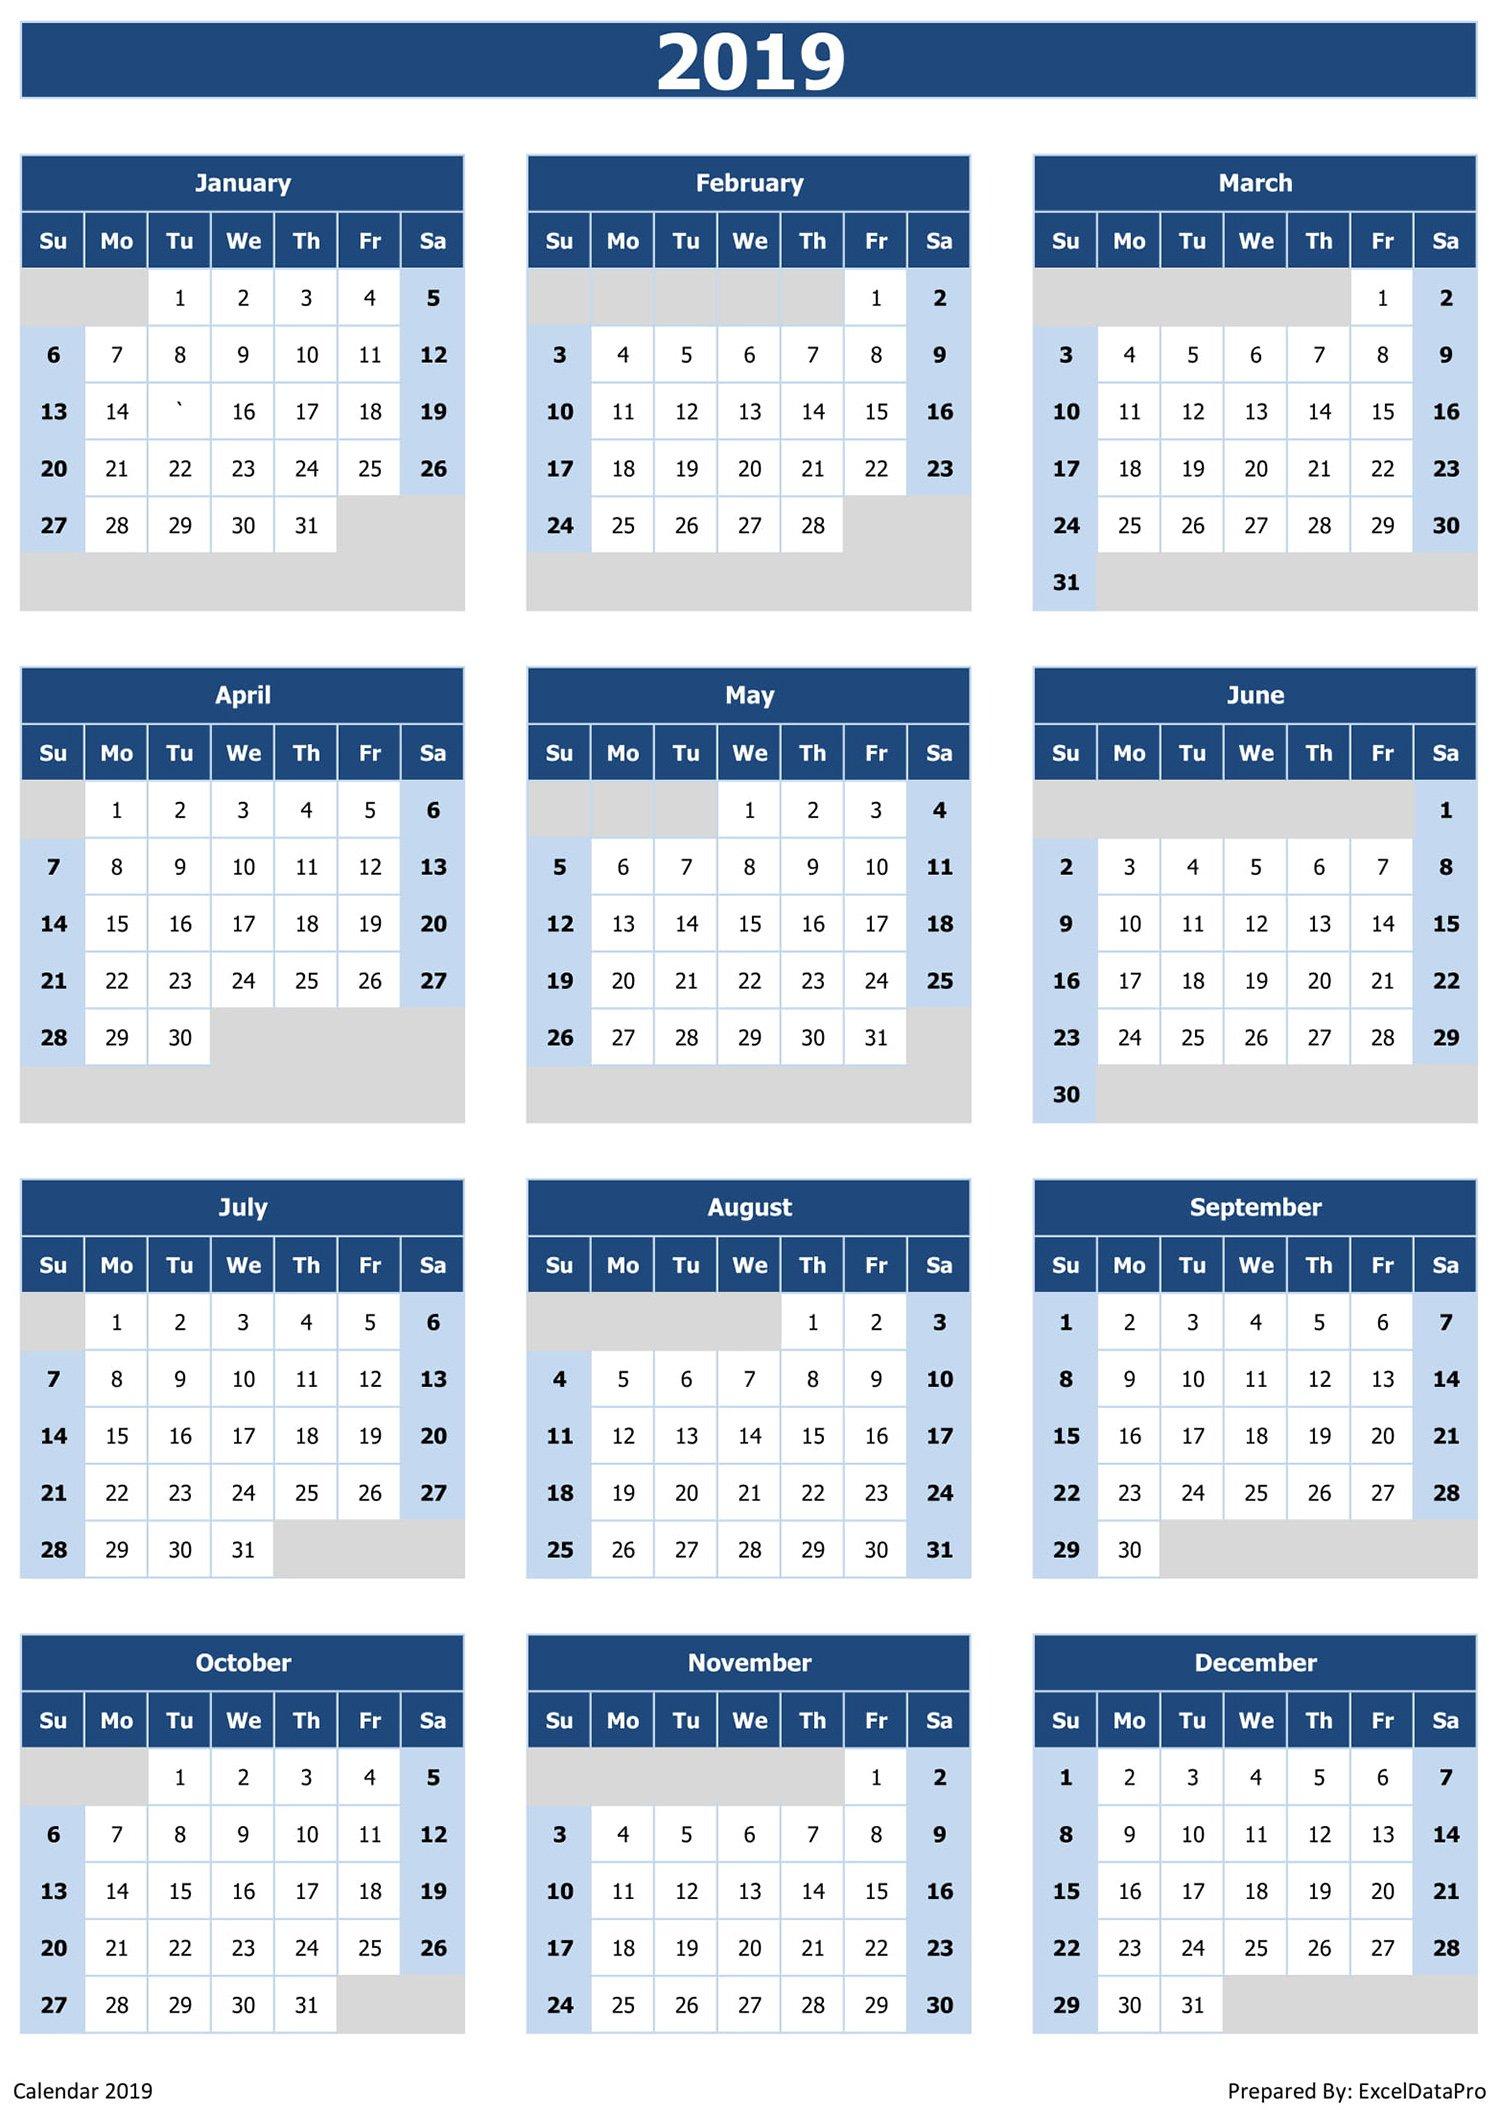 2019 Calendar Excel Templates, Printable Pdfs & Images – Exceldatapro Calendar 2019 View